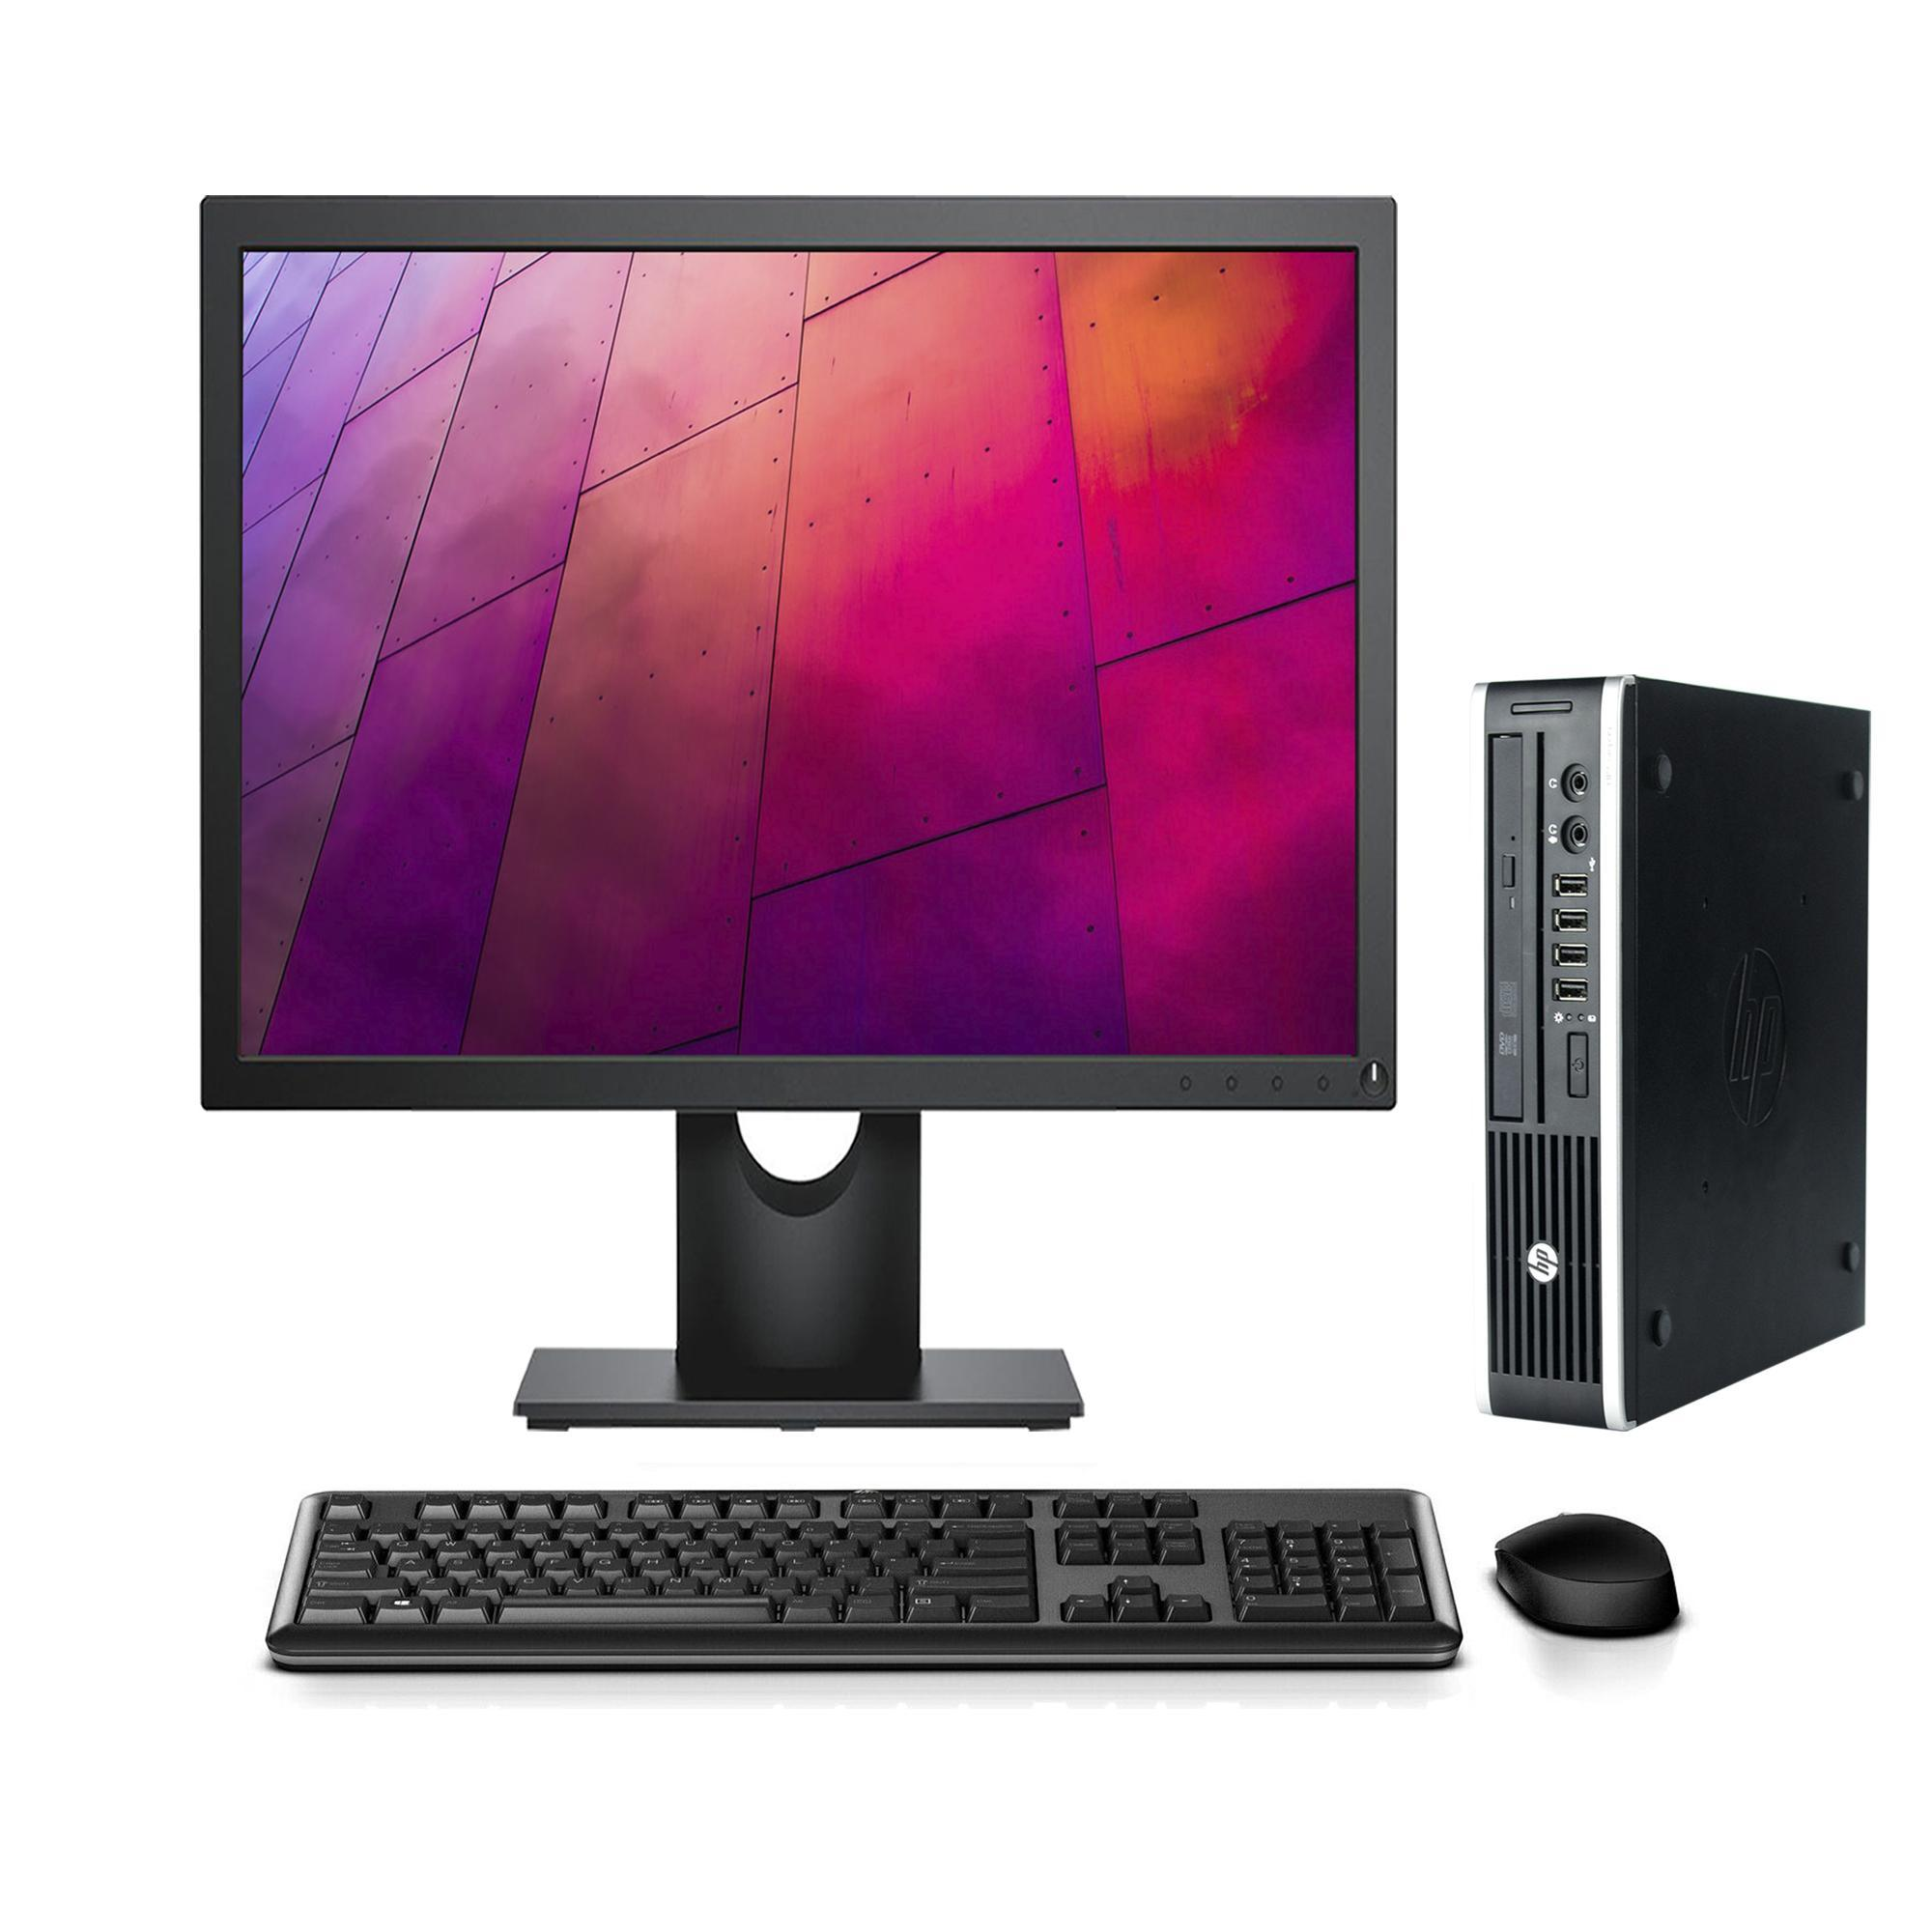 Hp Compaq 8300 Elite USFF Core i5 2.9 GHz - HDD 500 GB RAM 8GB